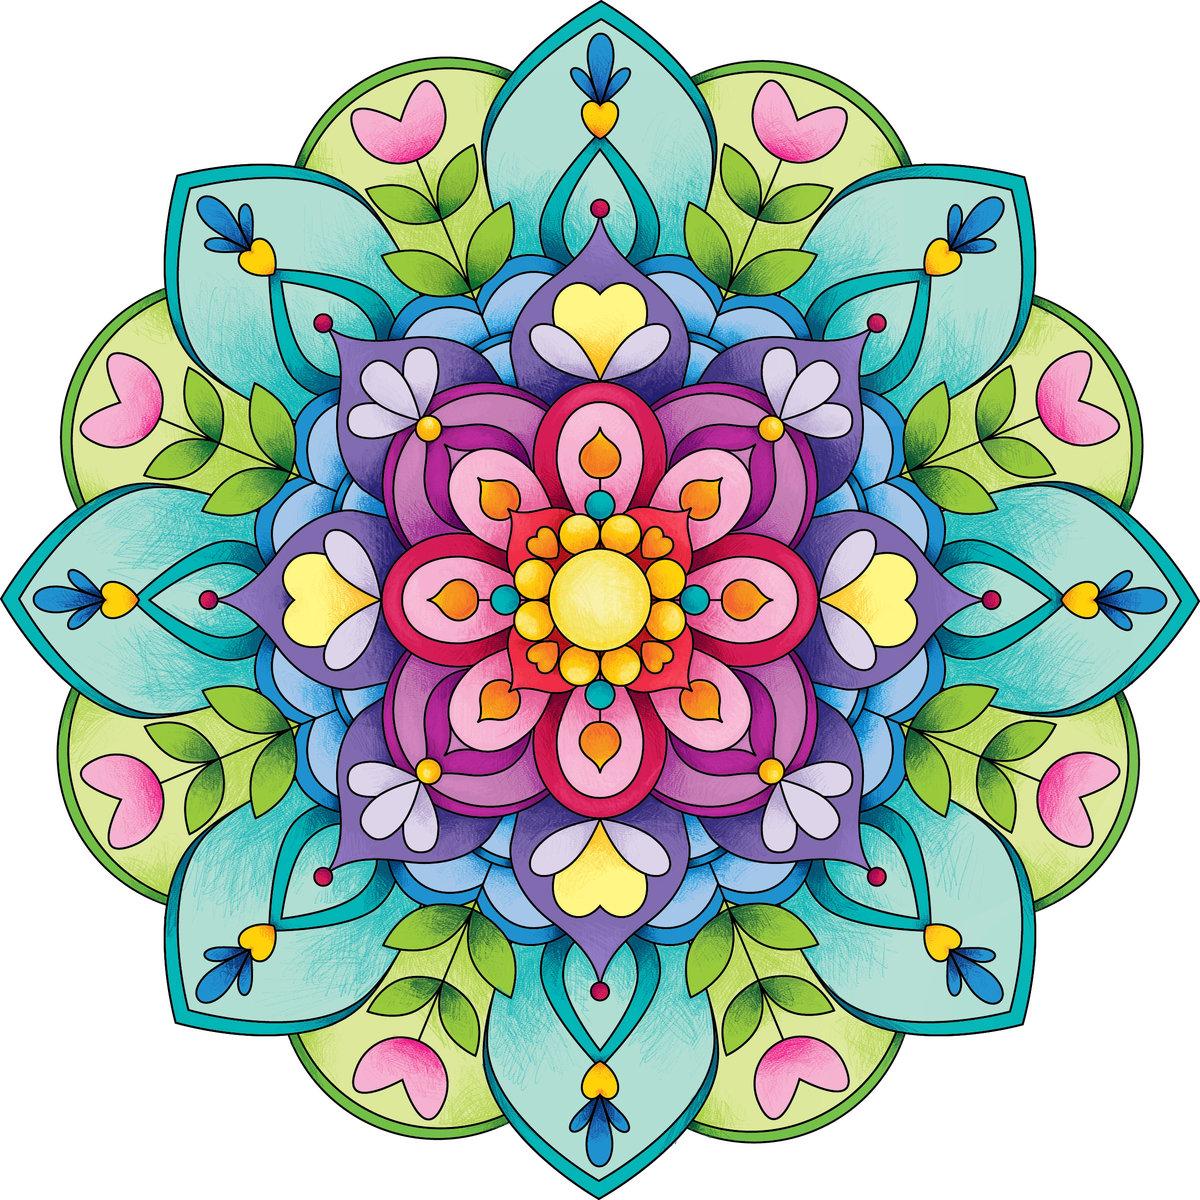 печать цветок в квадрате картинки без исключения мужья